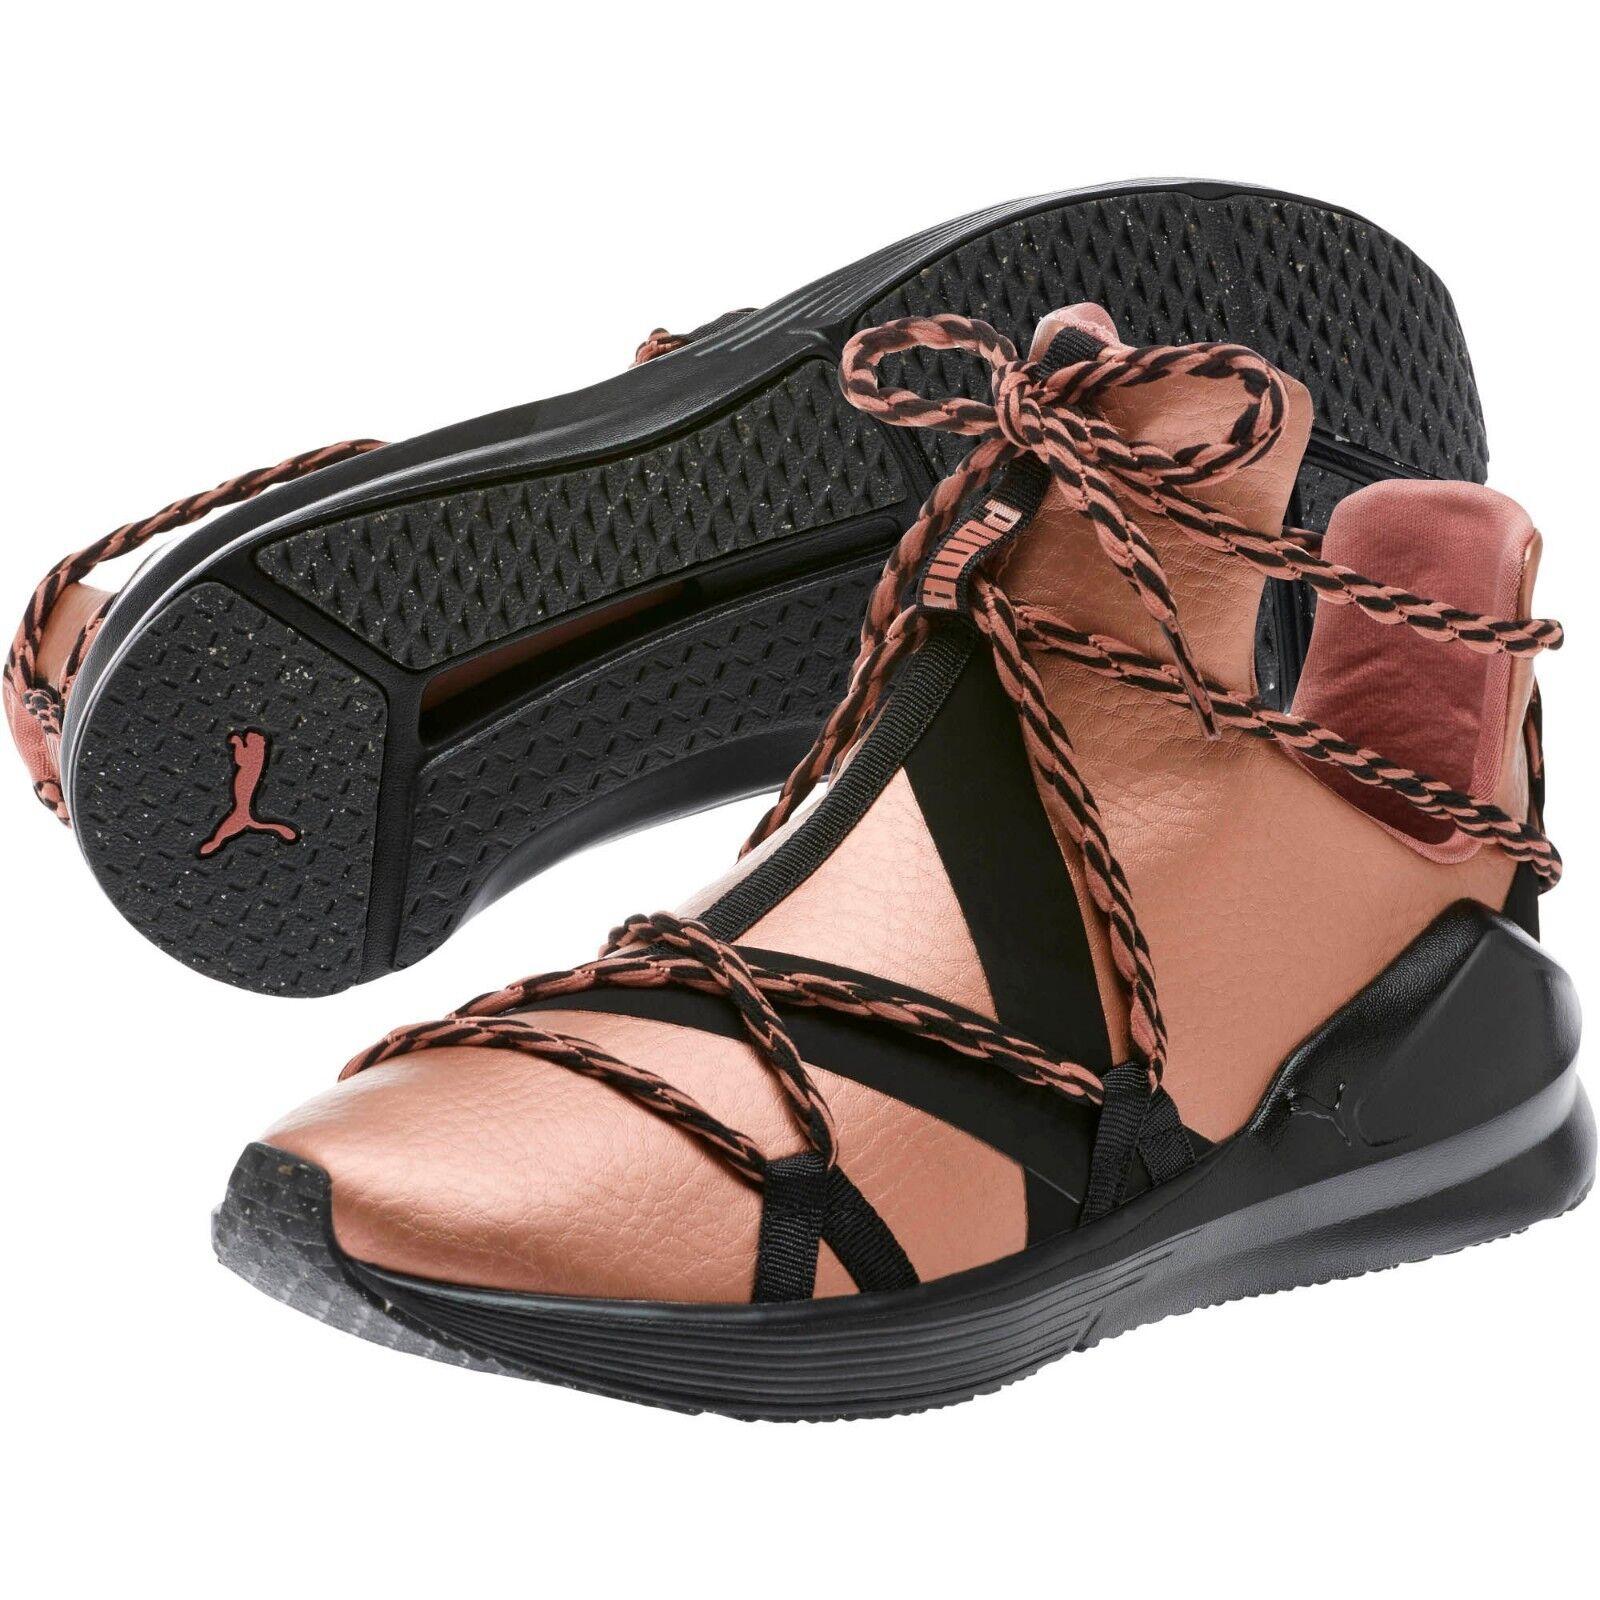 Puma Fierce 190705 Rope Bronze Femme Sneakers US 6.5 Bronze Noir Vegan new 385